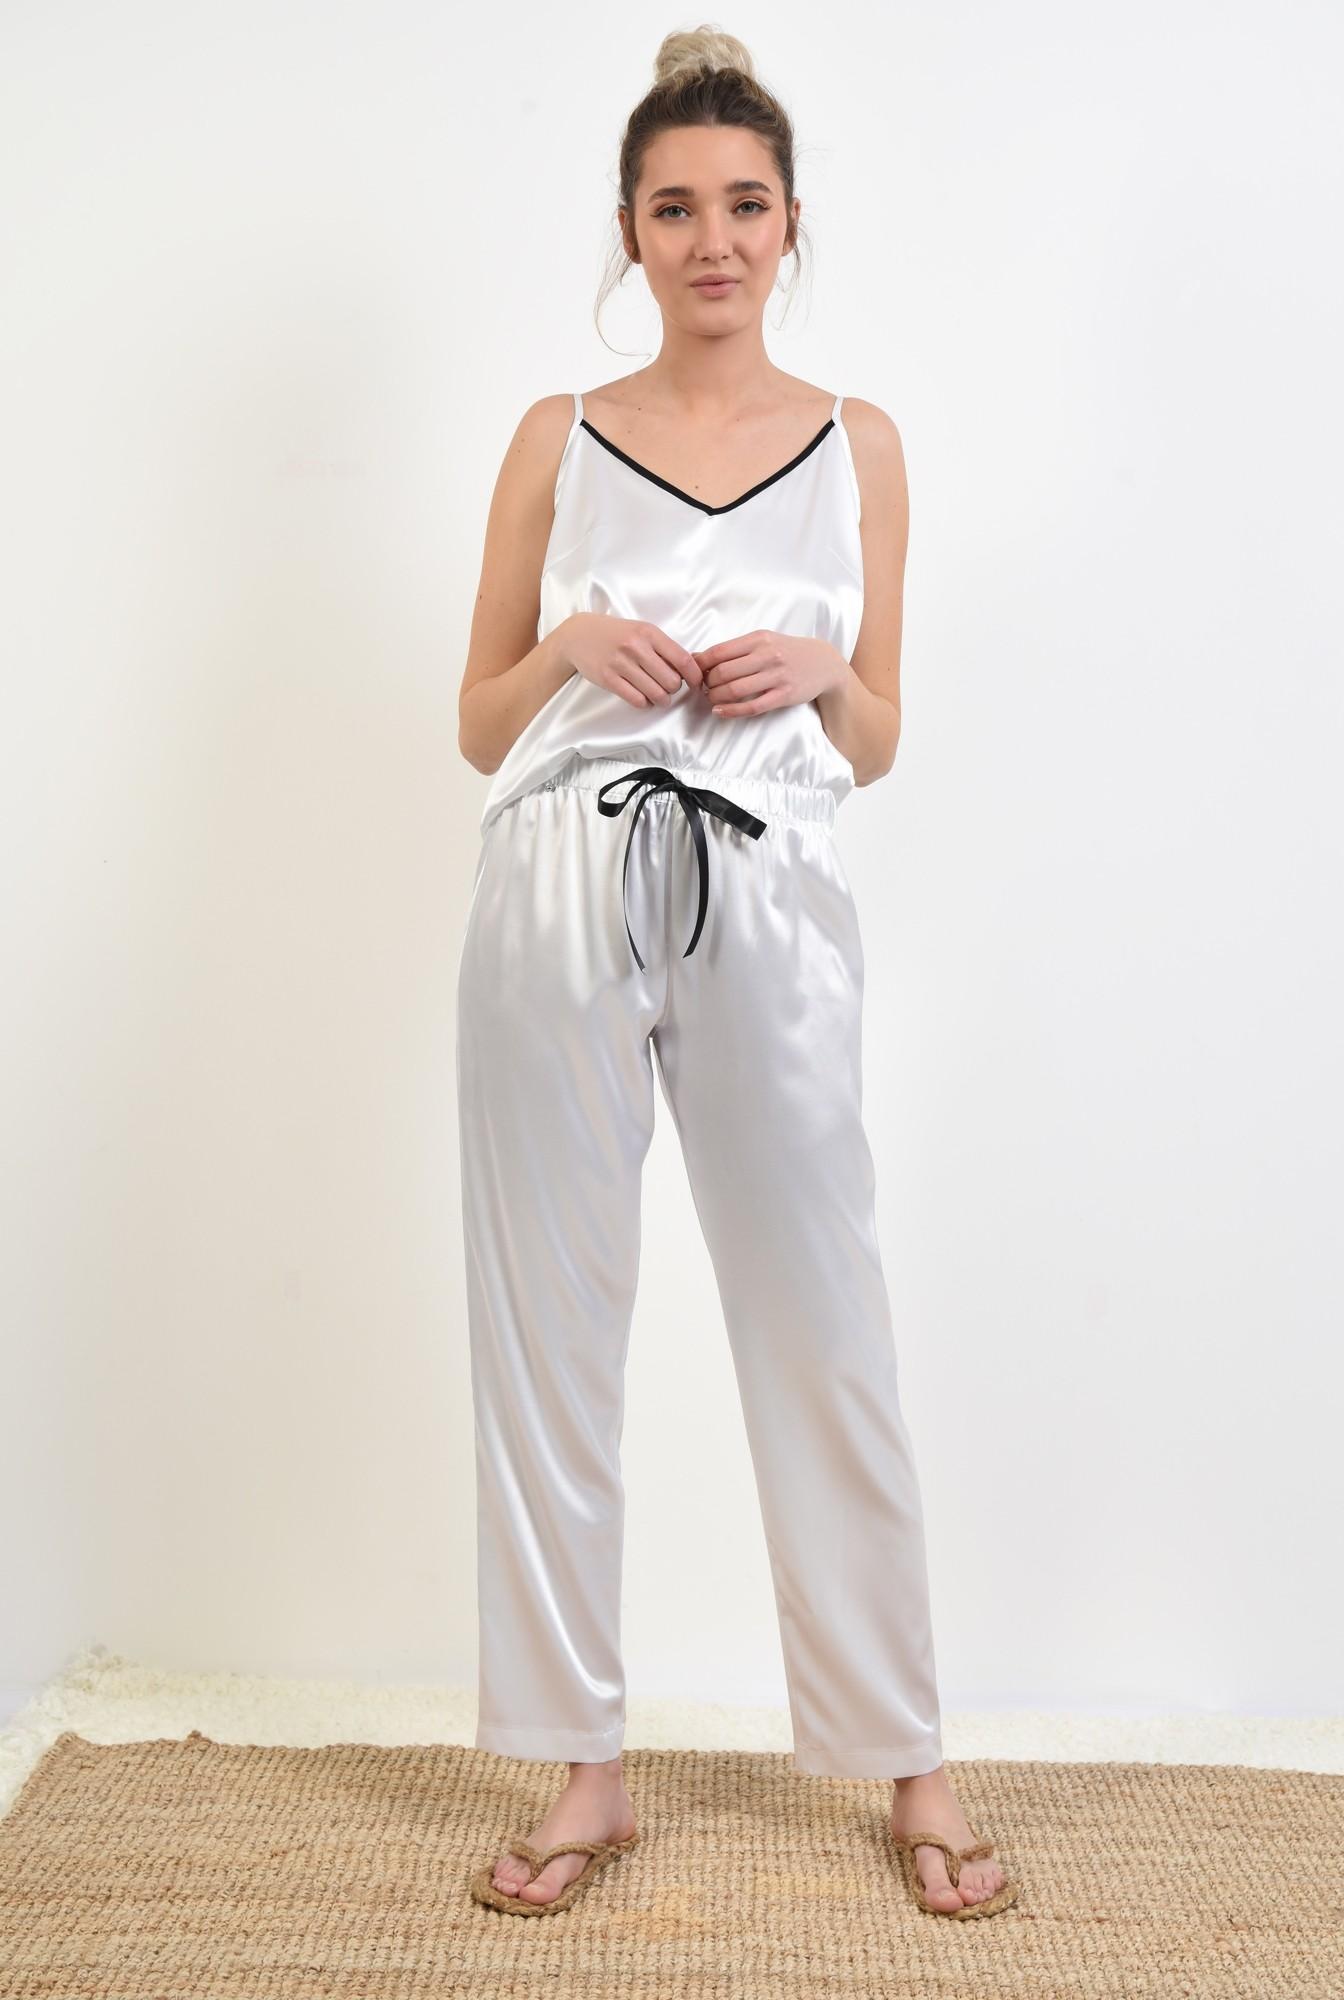 3 - pantaloni din satin, albi, lungi, cu funda in contrast